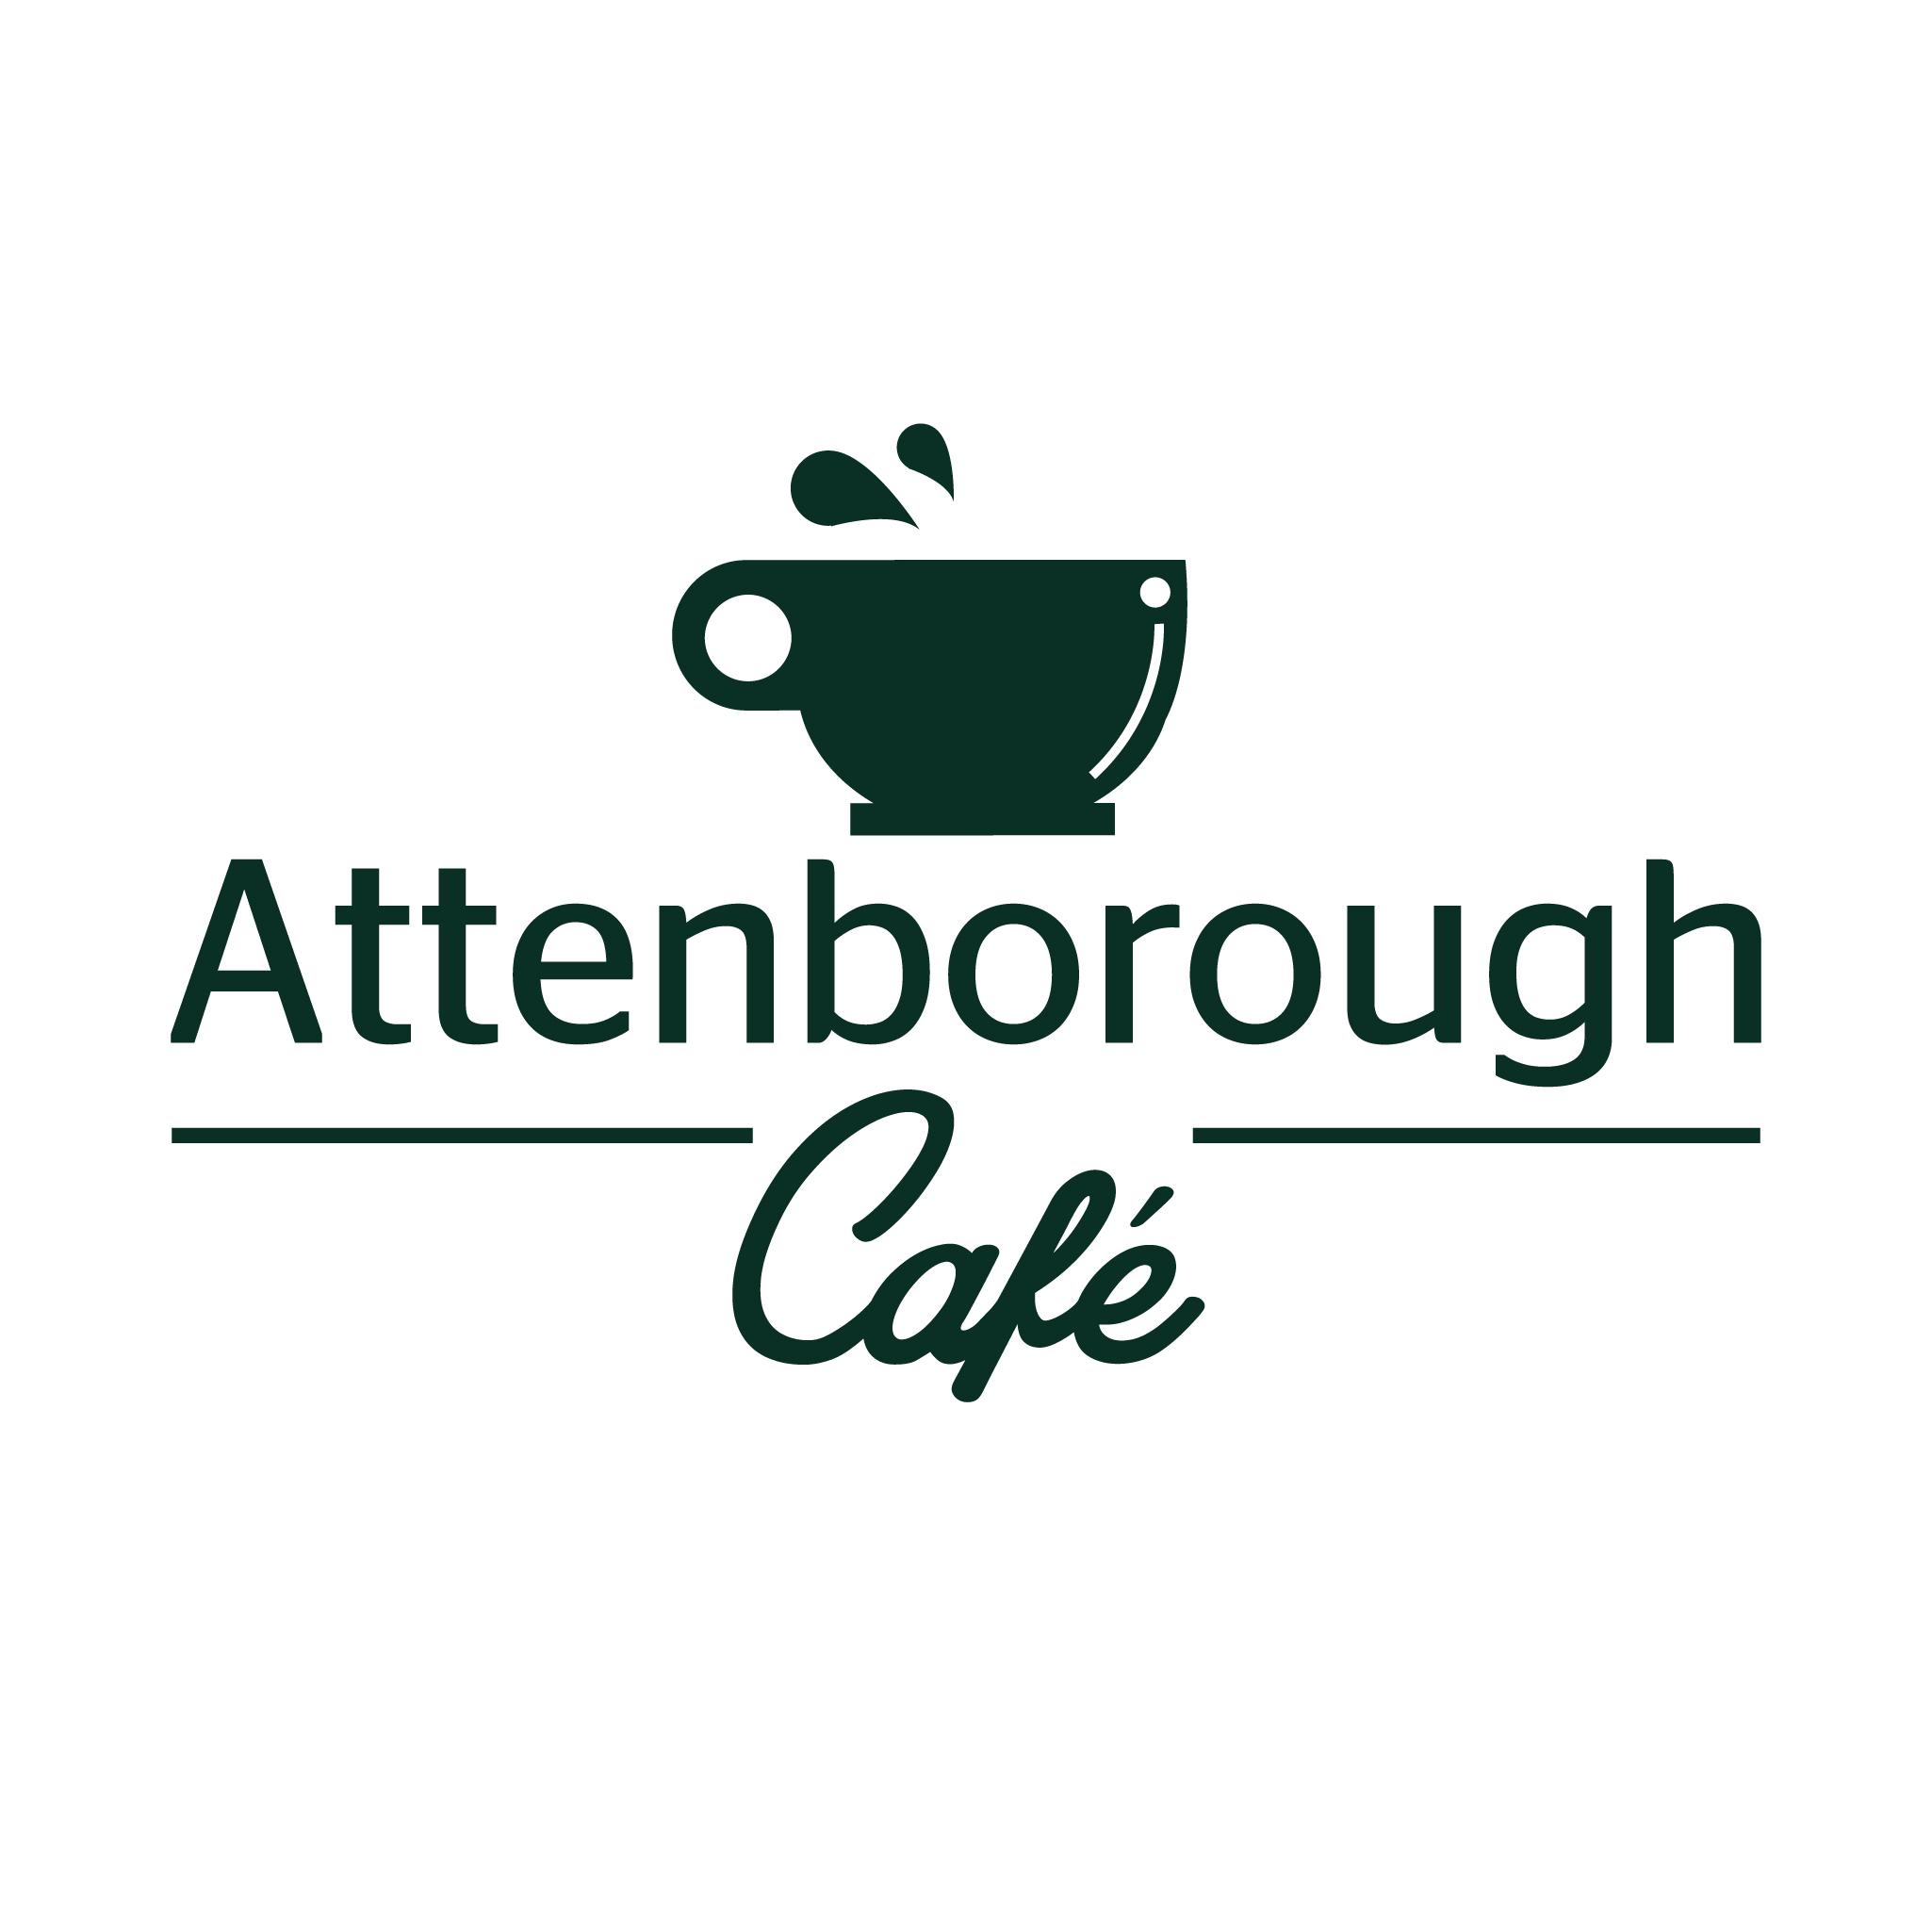 Attenborough Café